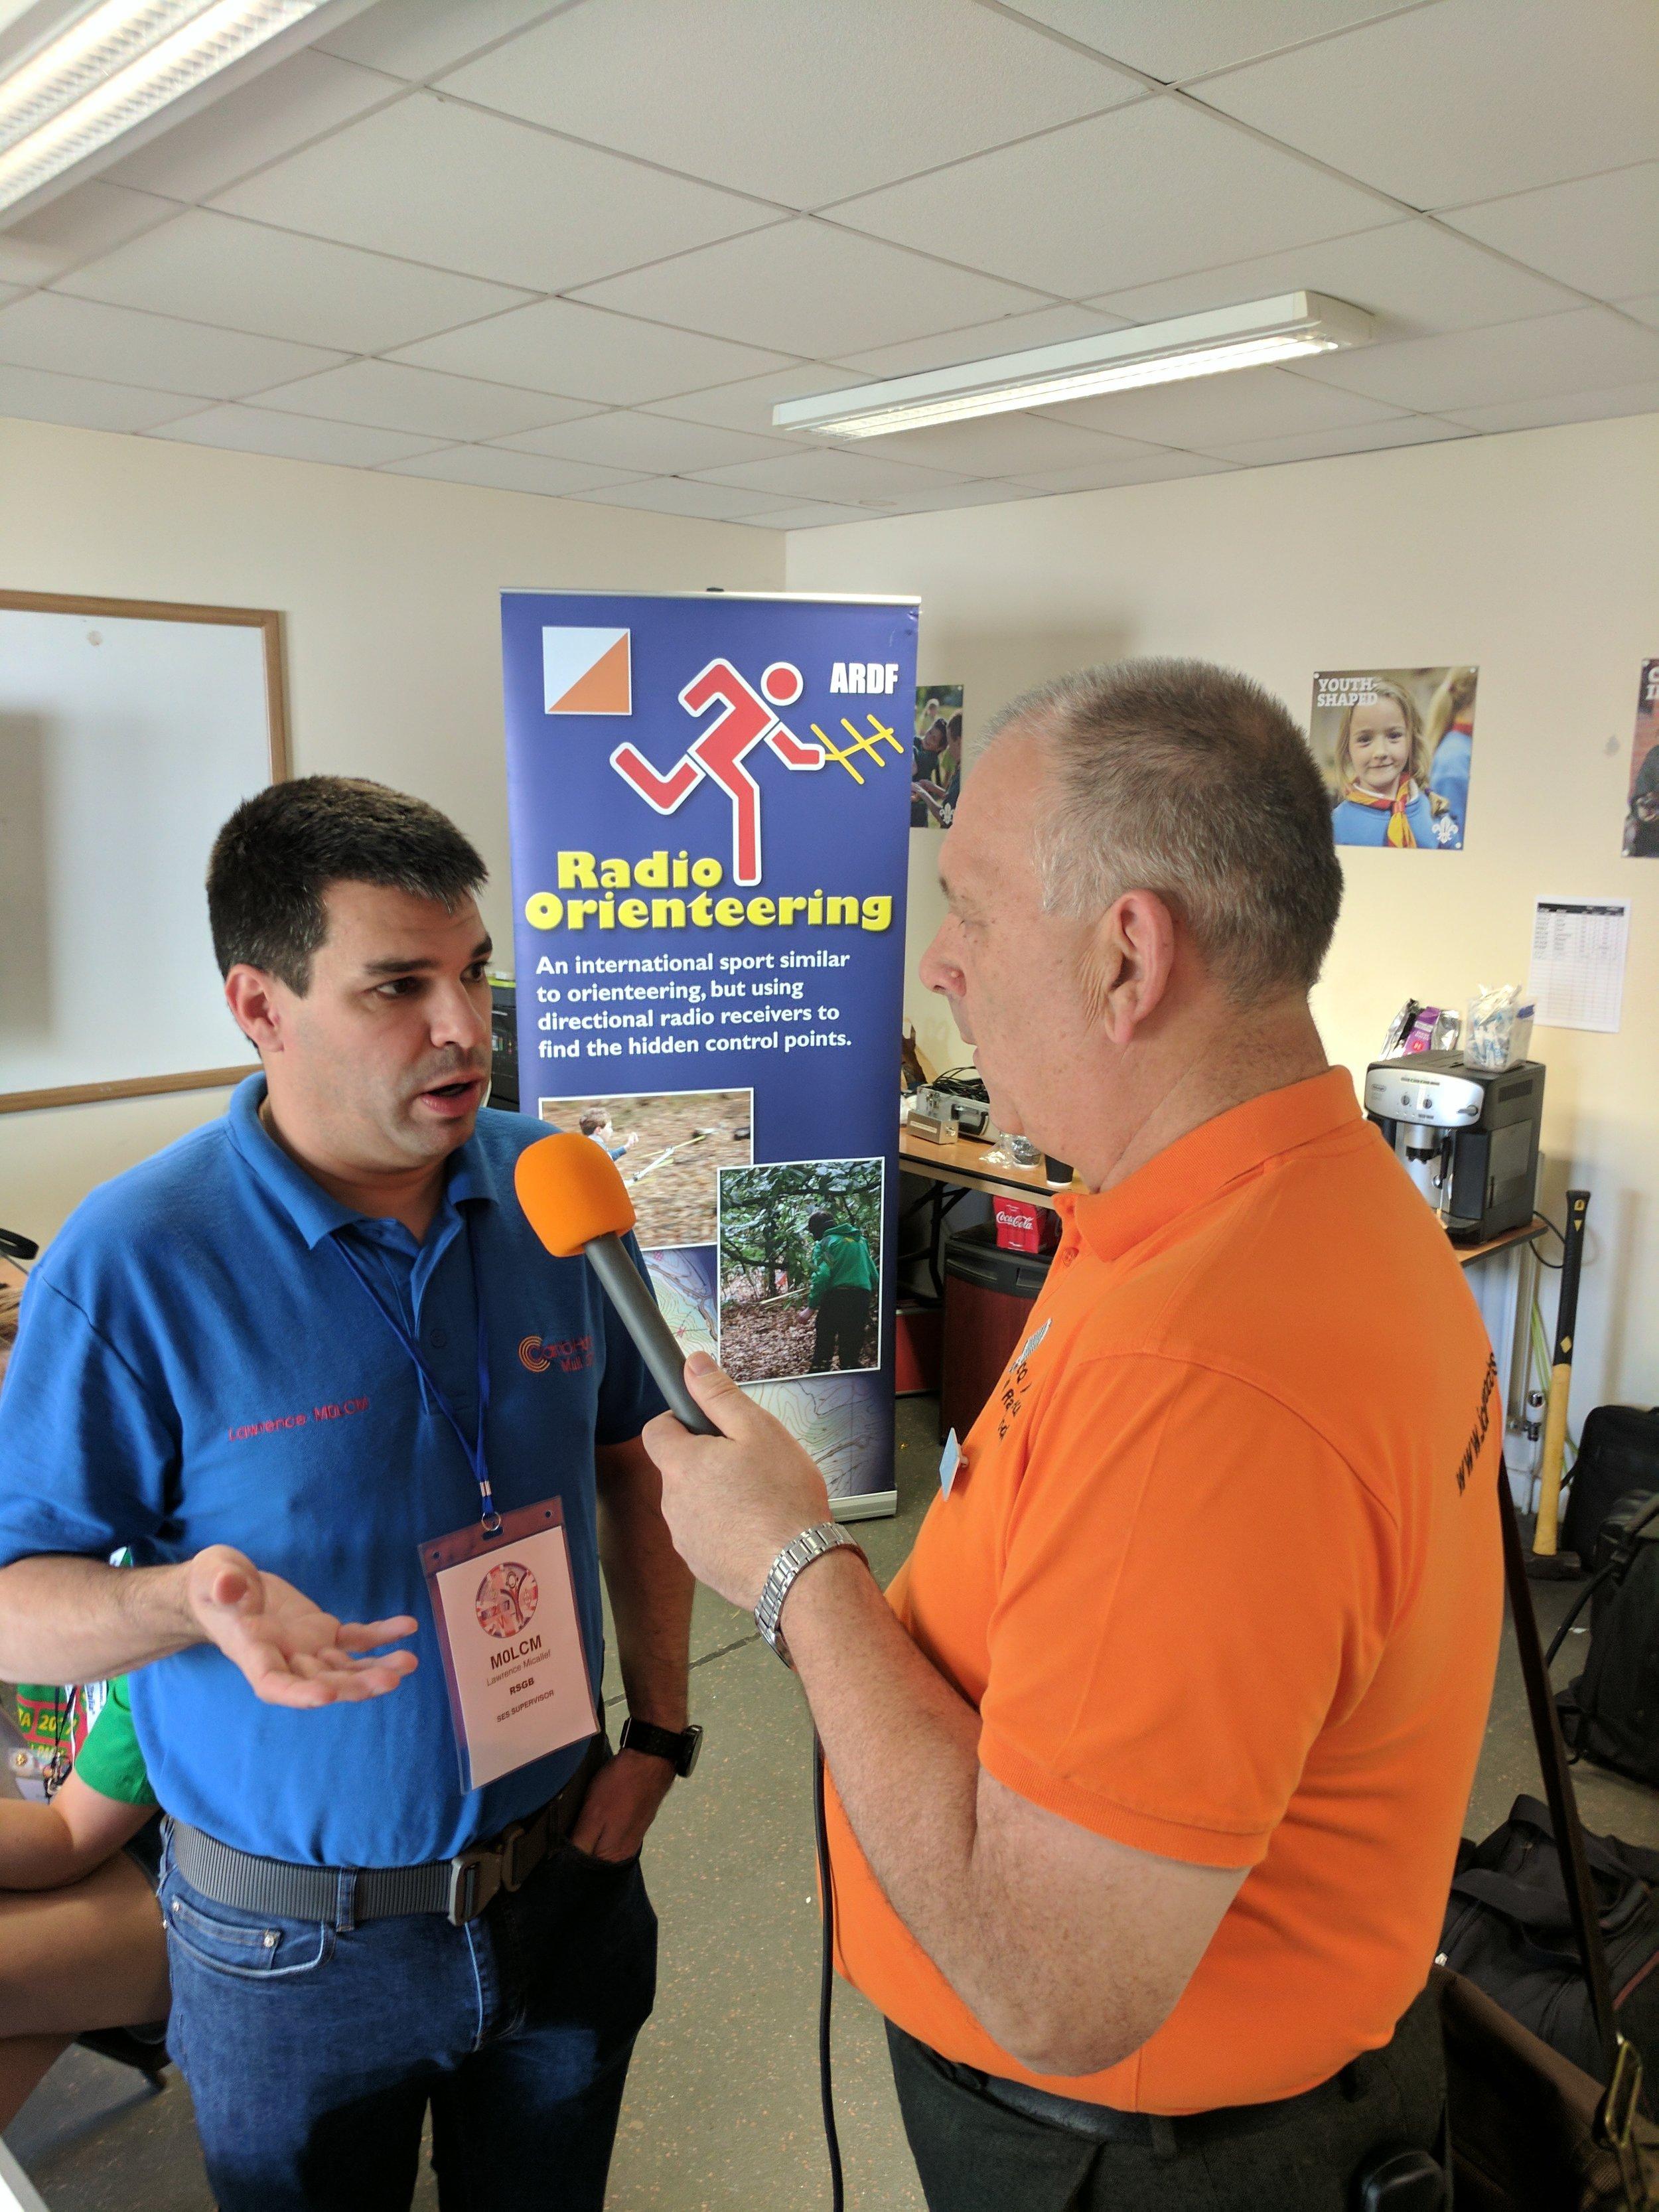 Martin Butler M1MRB/W9ICQ interviews M0LCN